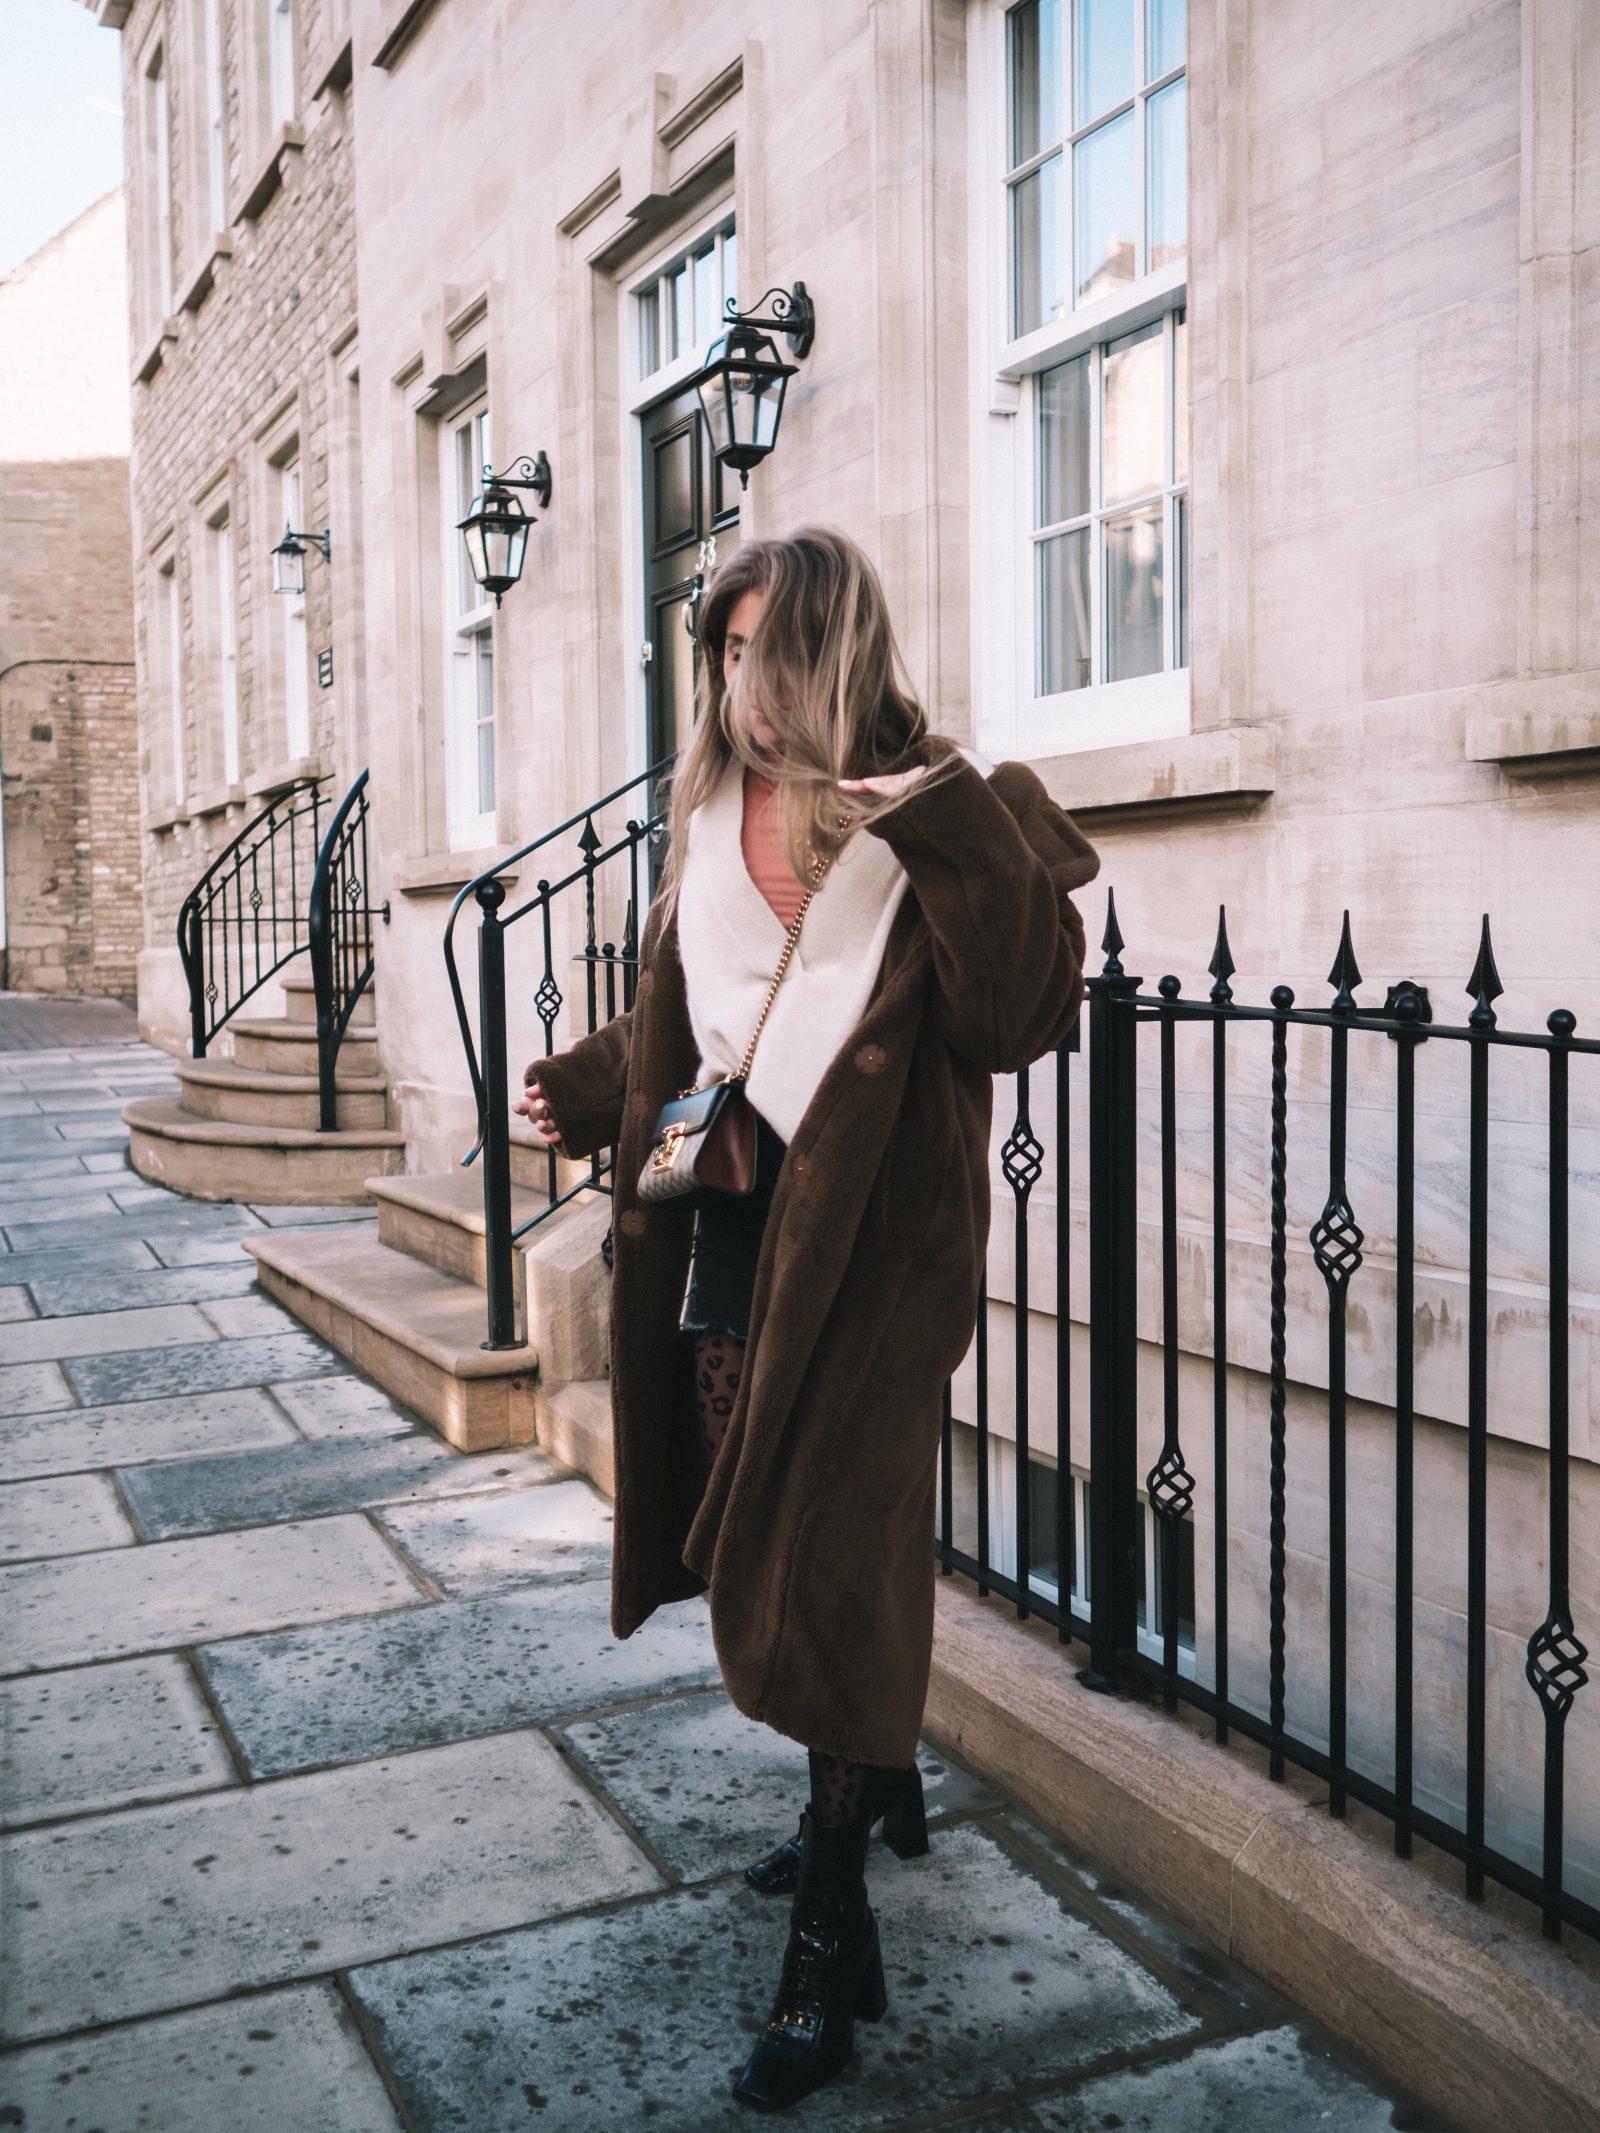 Warmest Coat - Fur Maxi Coat - Sinead Crowe Autumn Street Style